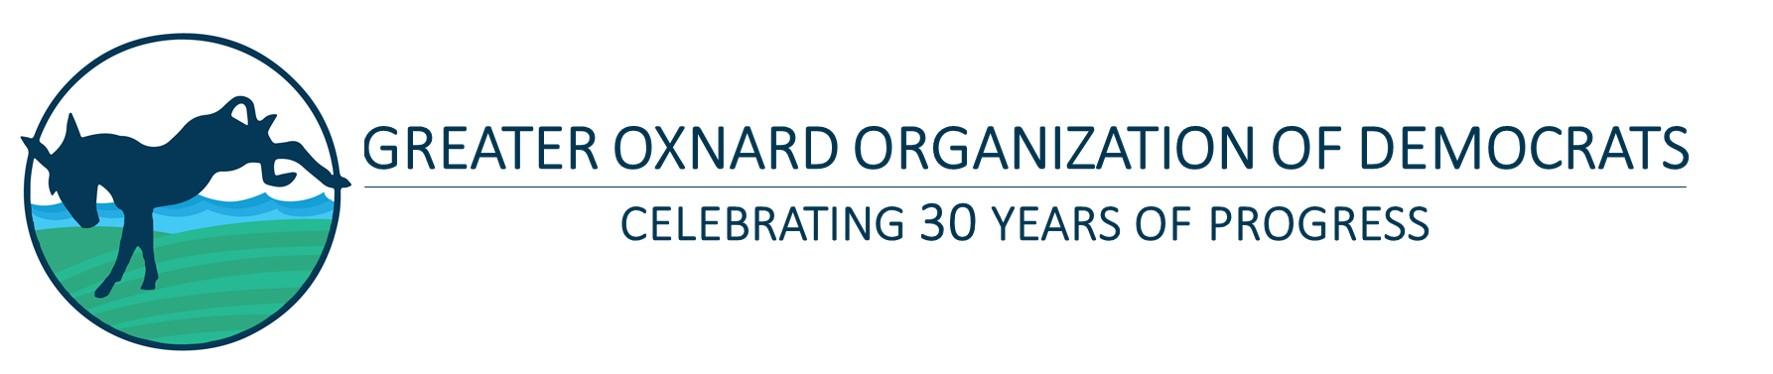 Greater Oxnard Organization of Democrats